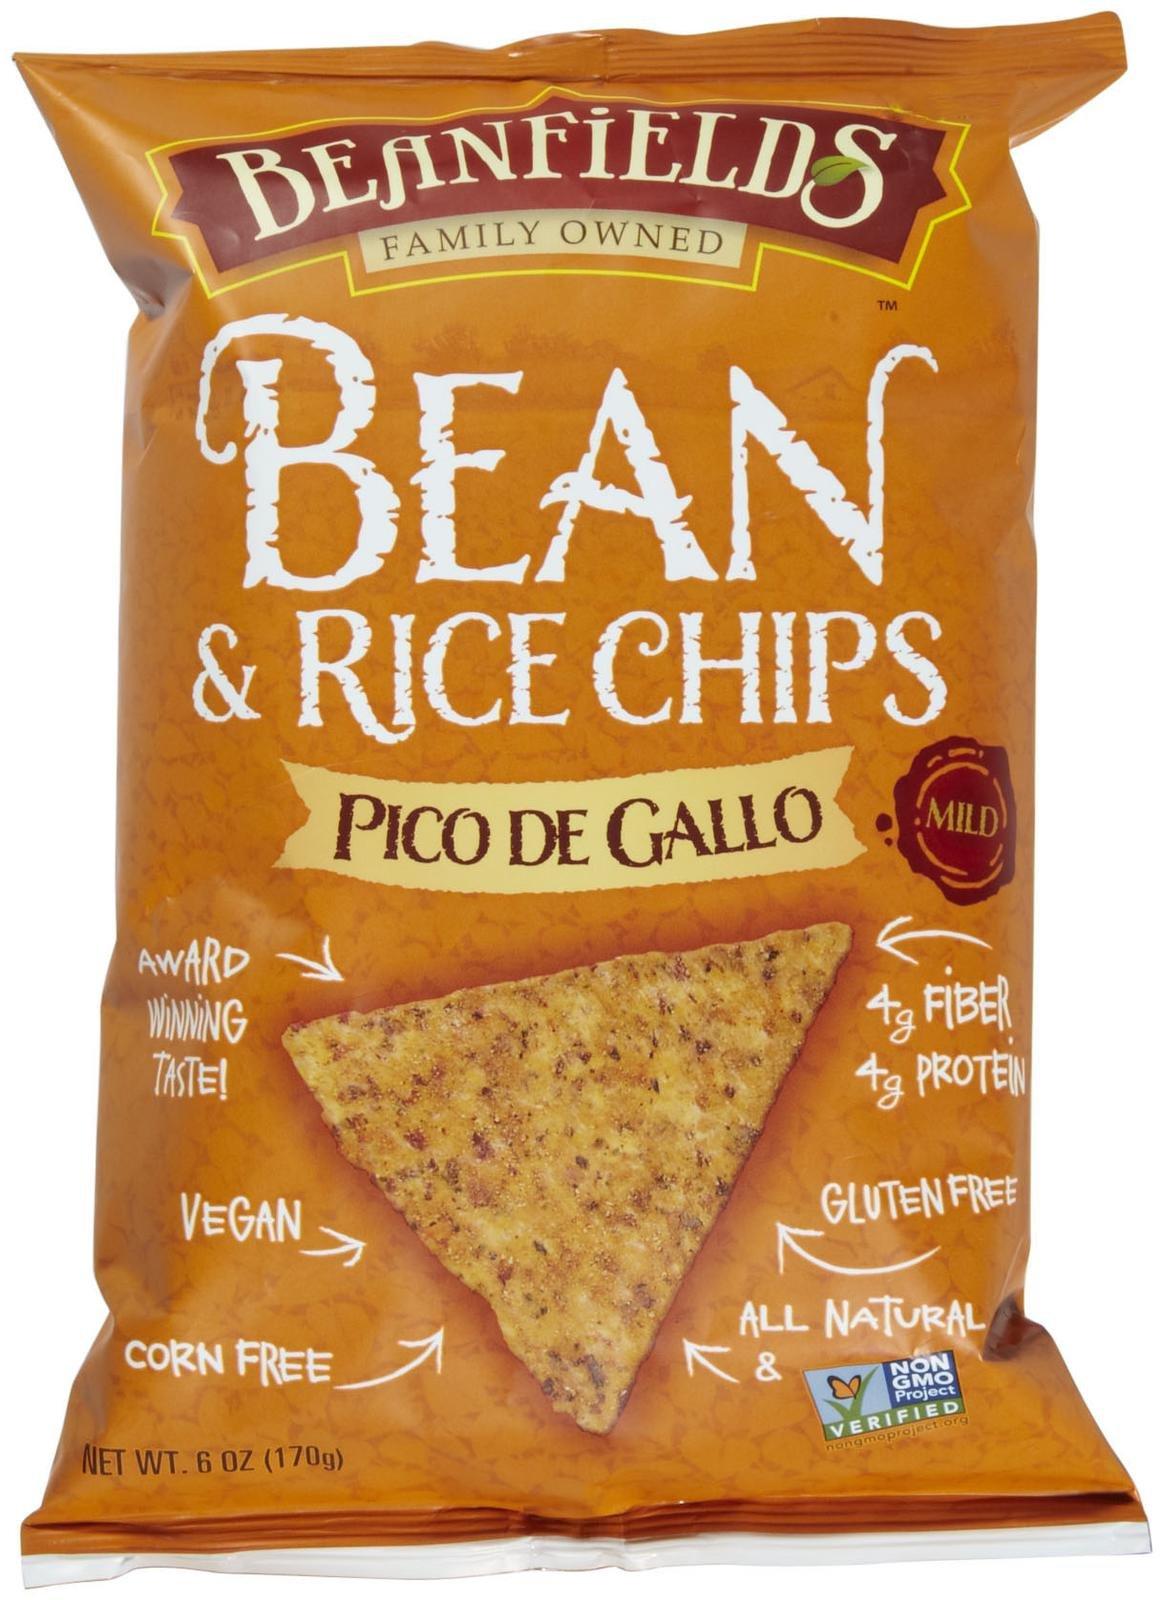 Beanfields Bean & Rice Chips - Pico De Gallo